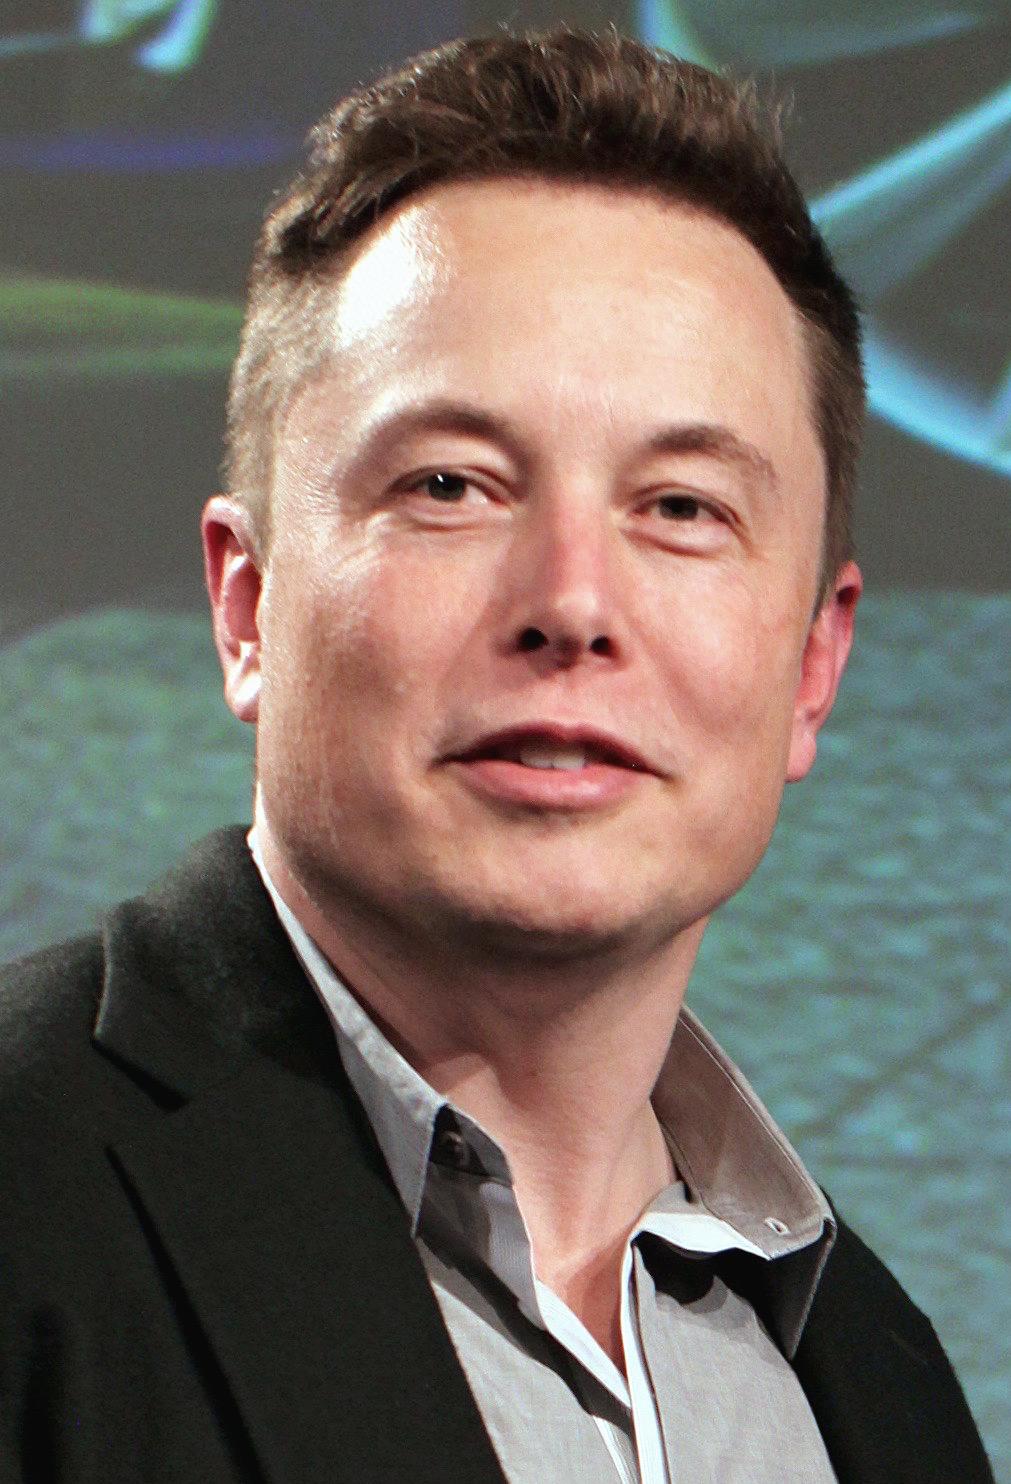 Elon Musk 2015 wikipedia copy